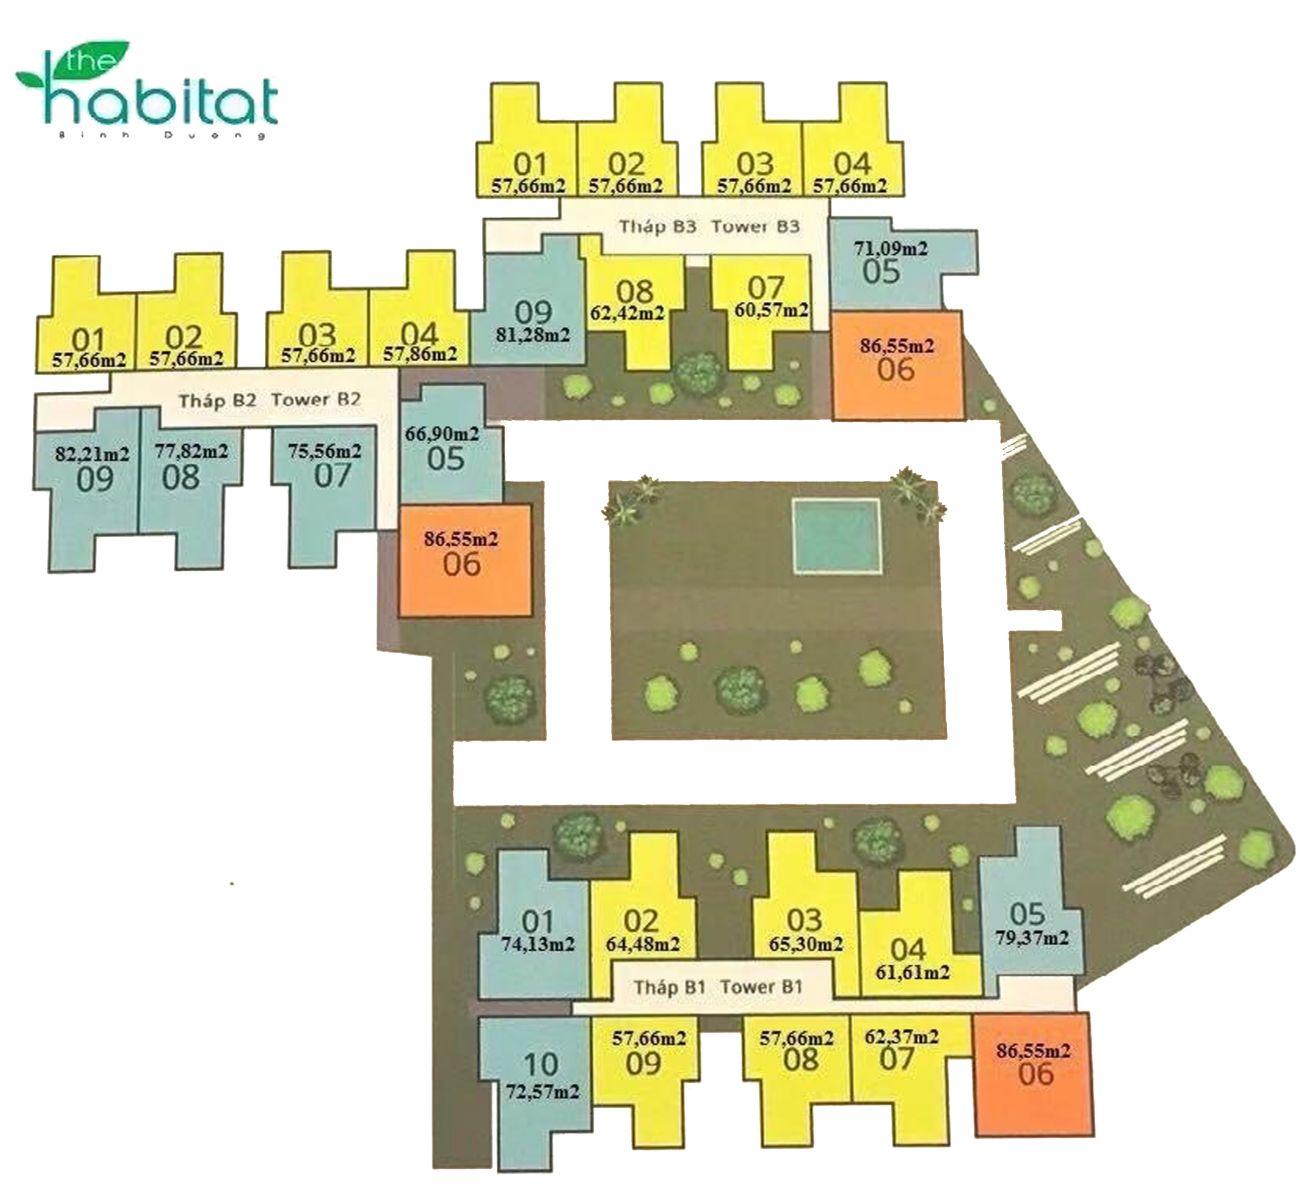 habitat giai đoạn 2